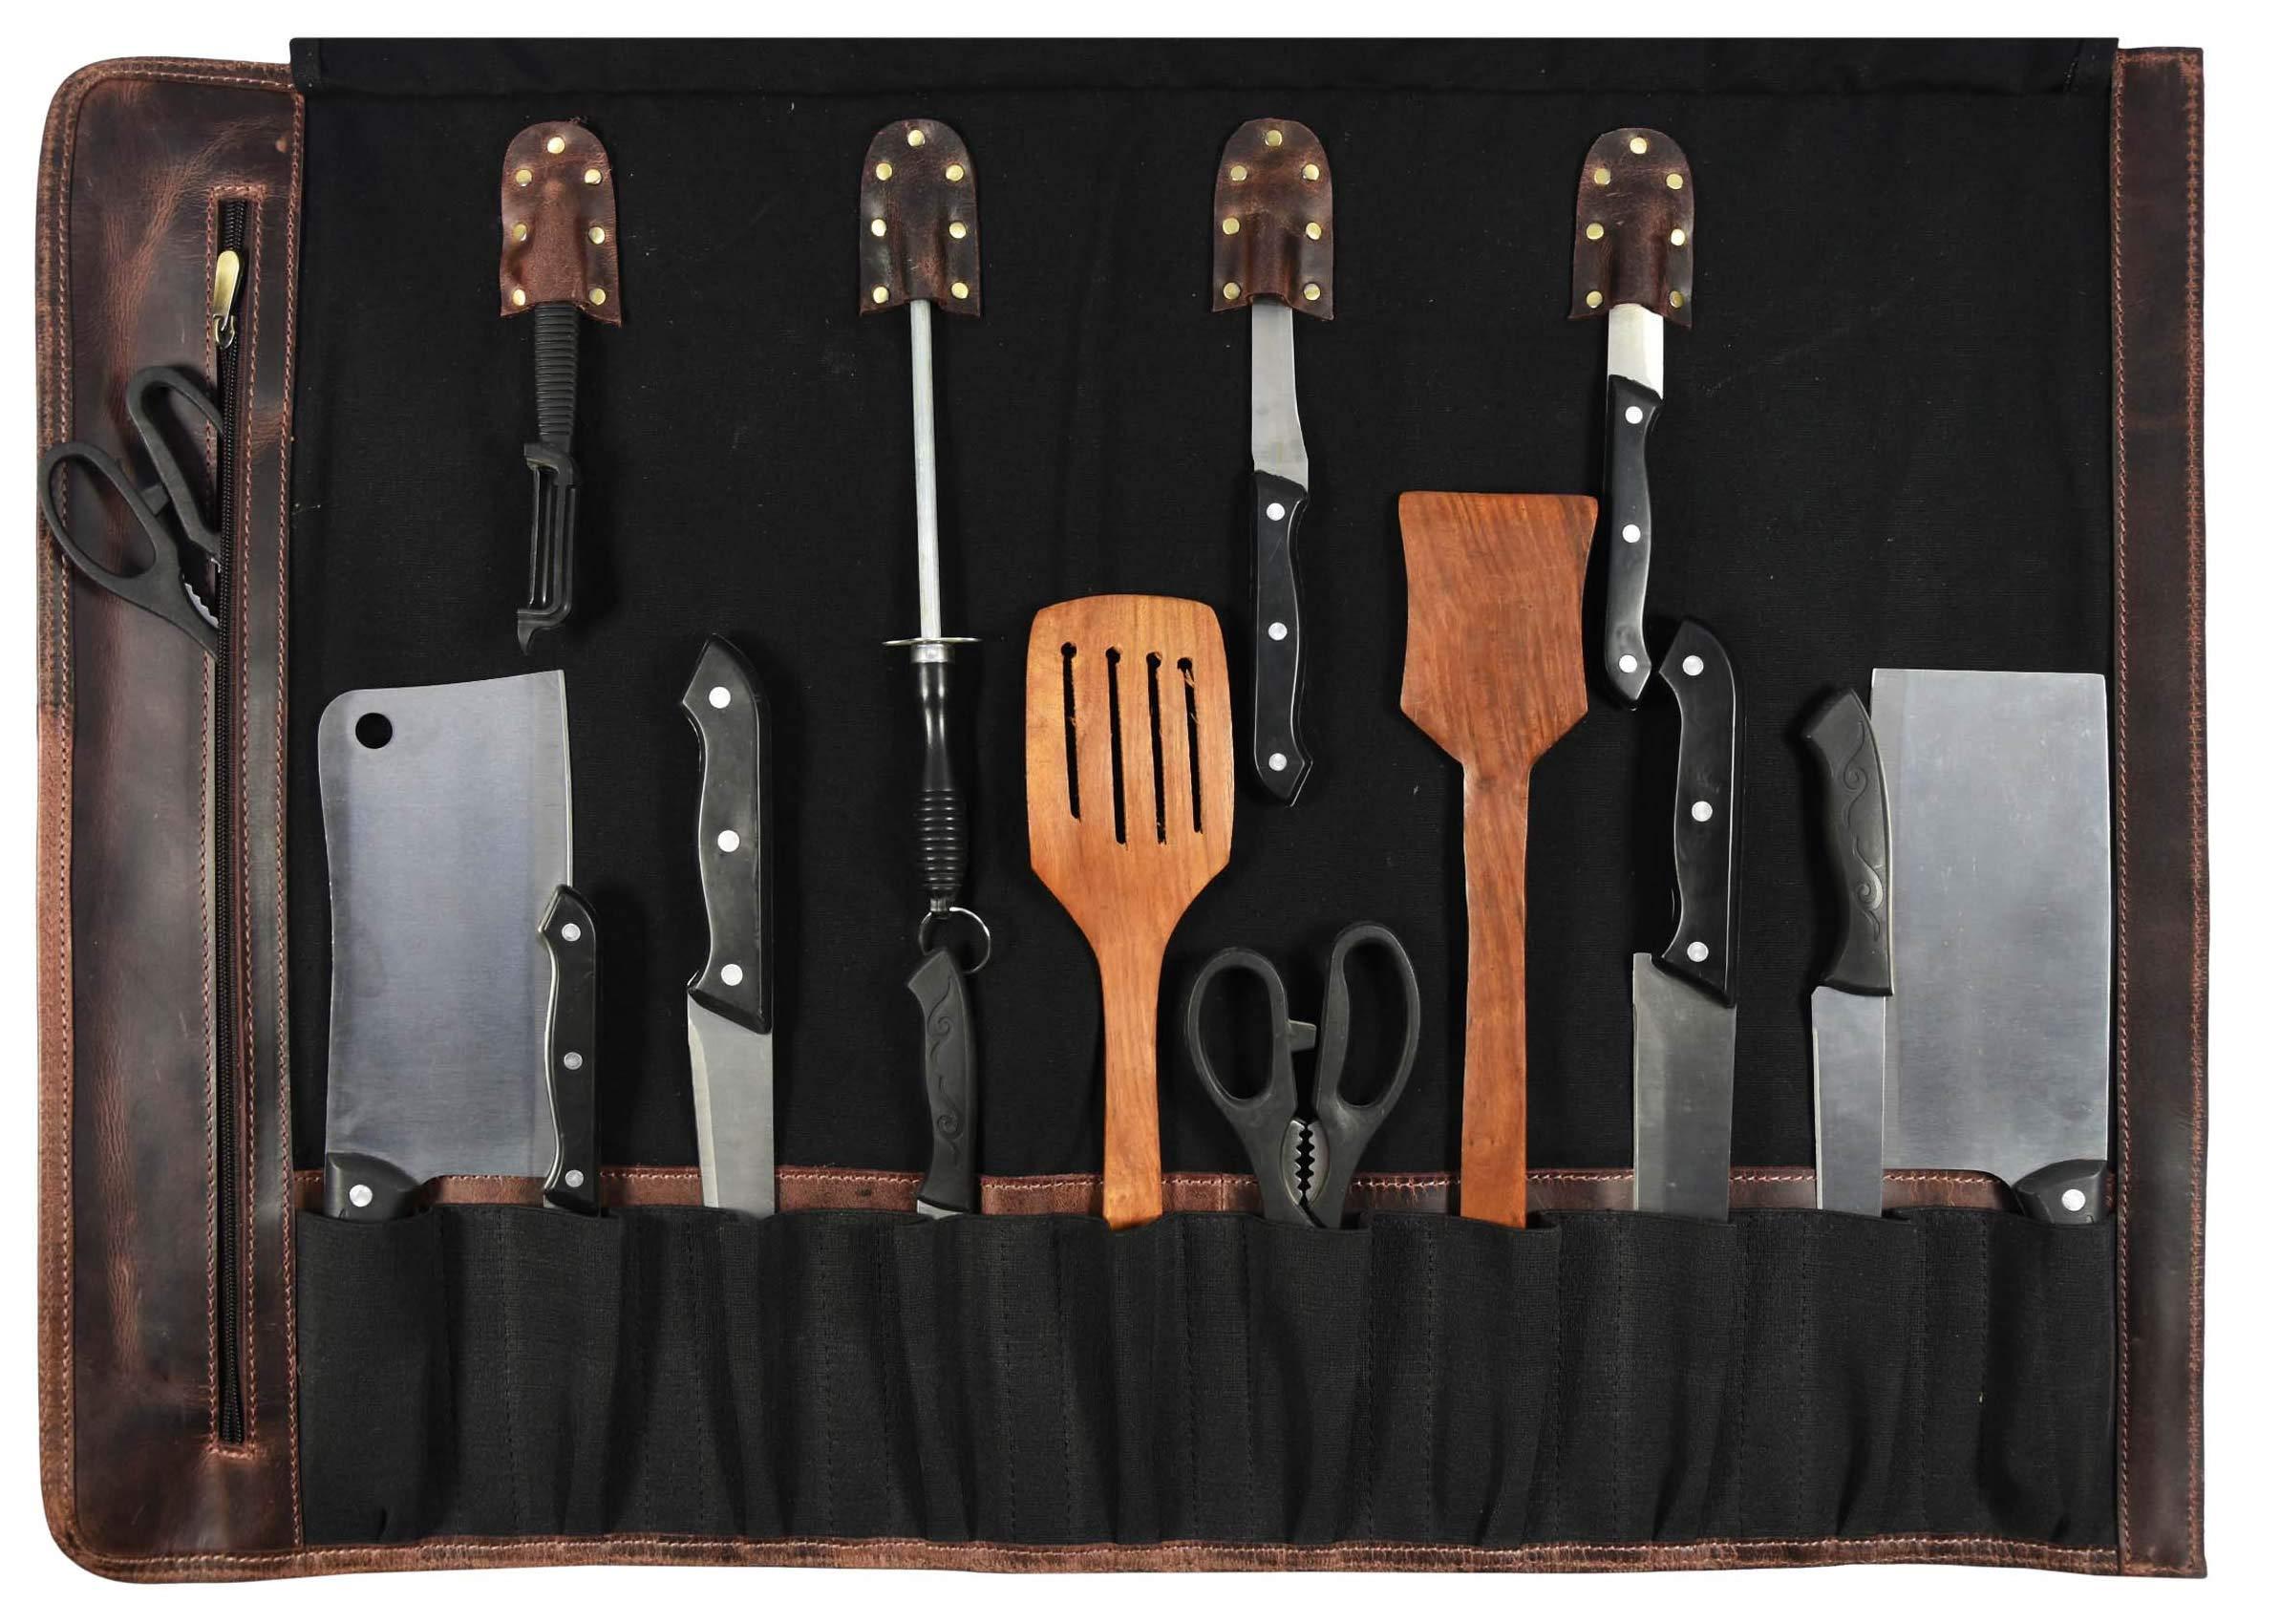 Leather Knife Roll Storage Bag   Elastic and Expandable 10 Pockets   Adjustable/Detachable Shoulder Strap   Travel-Friendly Chef Knife Case Roll By Aaron Leather (Raven, Canvas) by AARON LEATHER GOODS VENDIMIA ESTILO (Image #2)